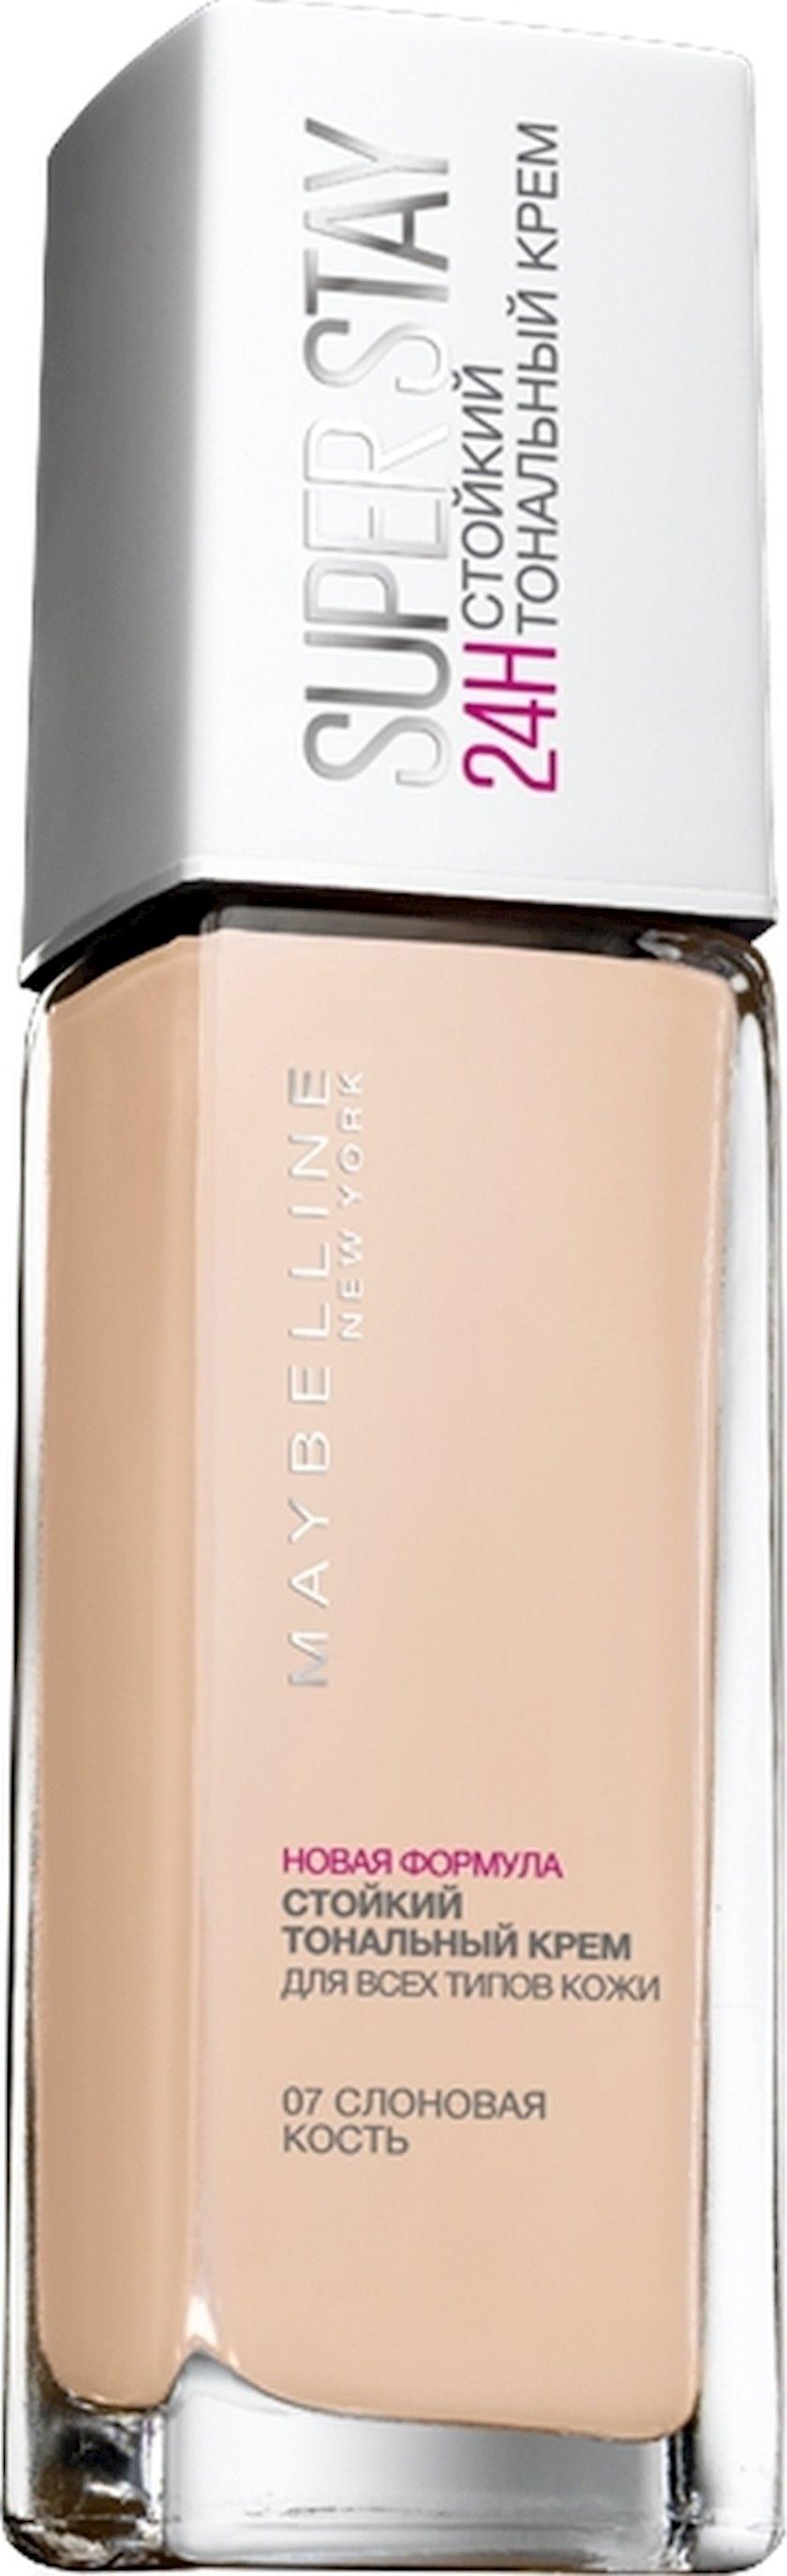 Tonal krem Maybelline New York SuperStay 24H çalar 07 Fil sümüyü 30 ml